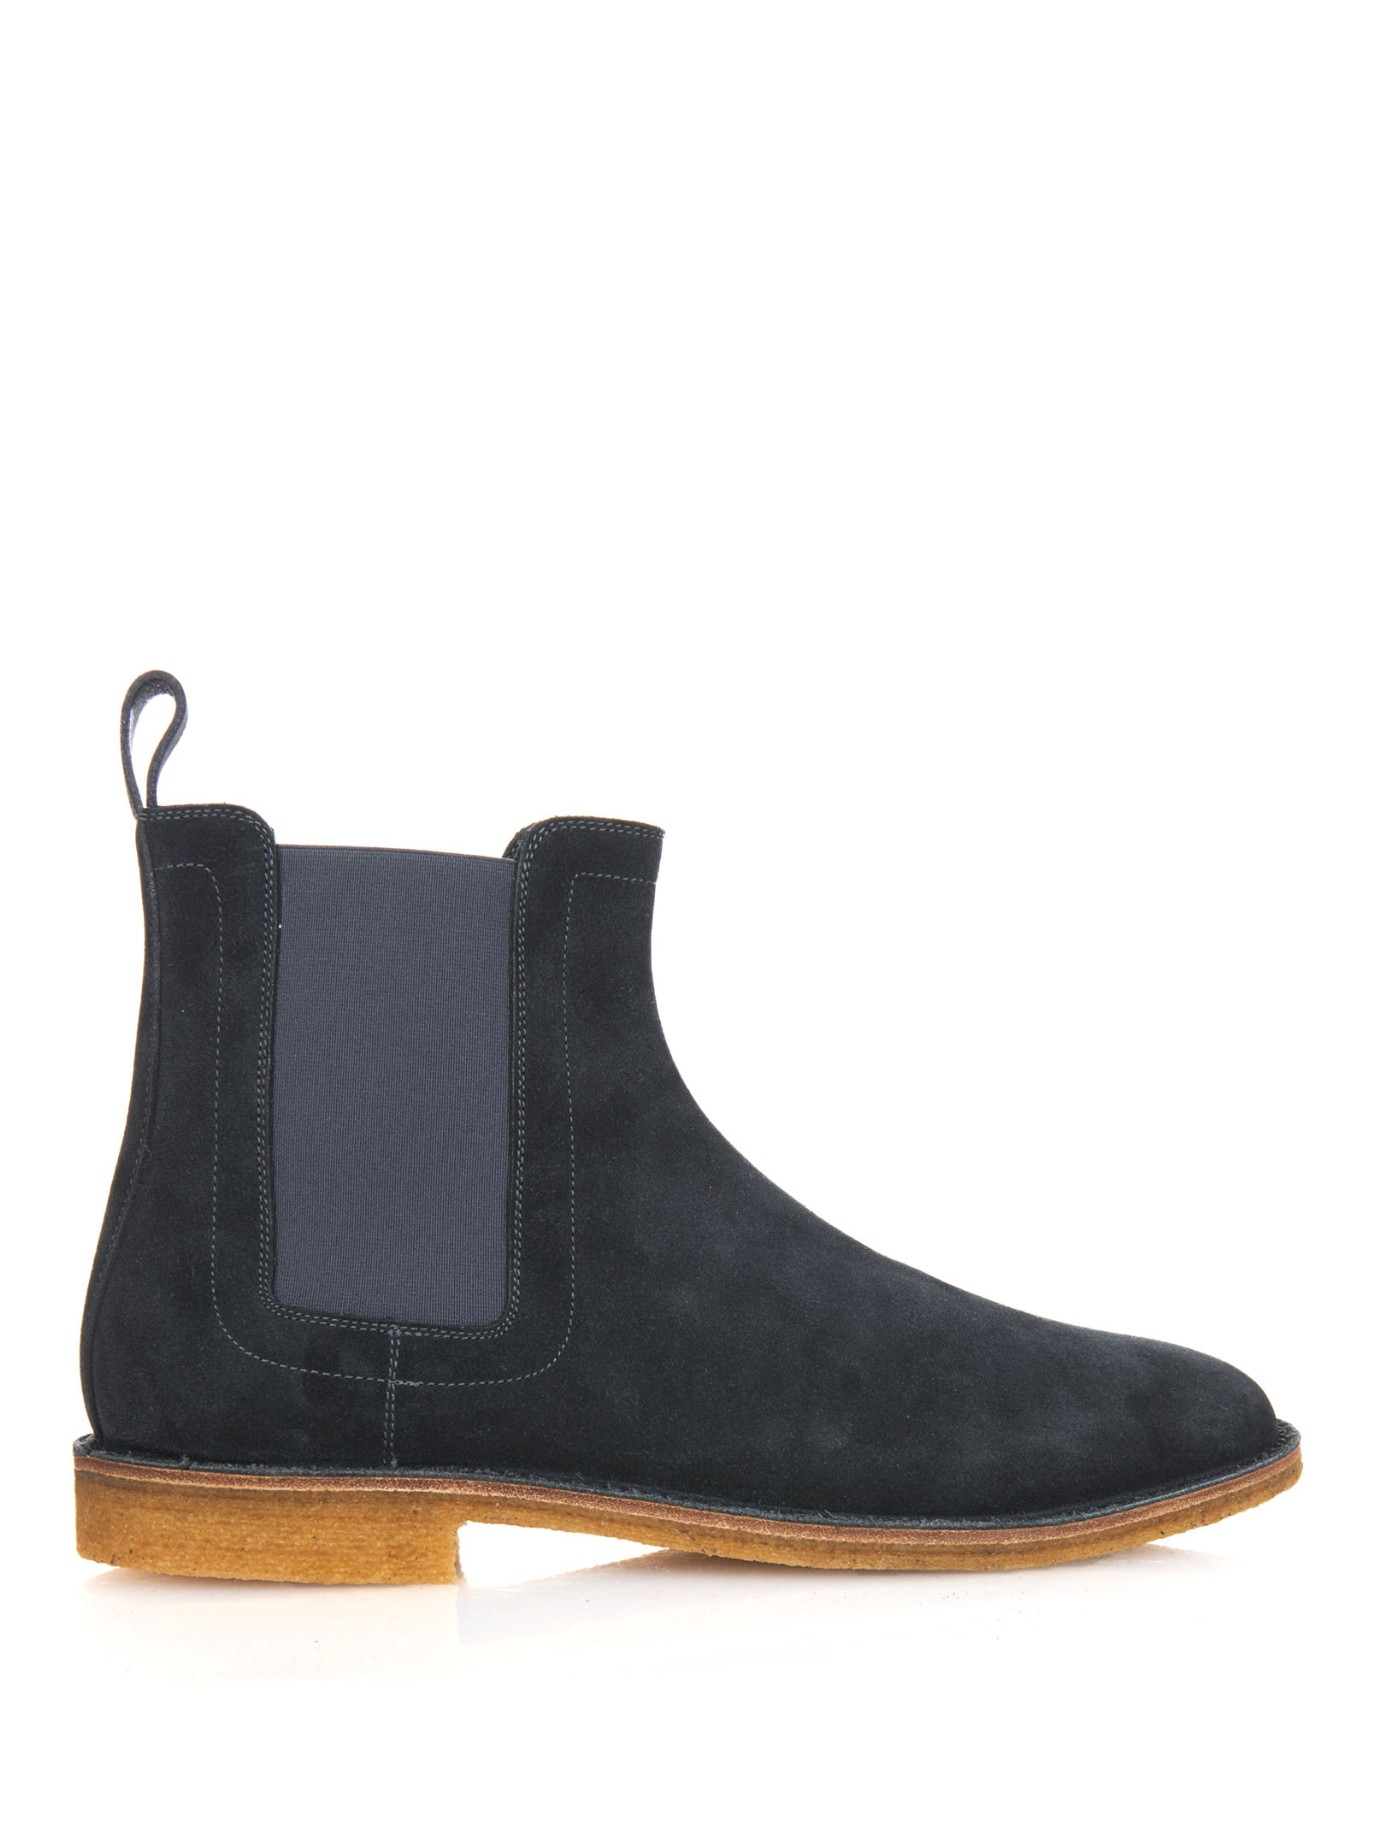 Lastest Bottega Veneta  Suede Chelsea Boot  Boots  Harry Rosen